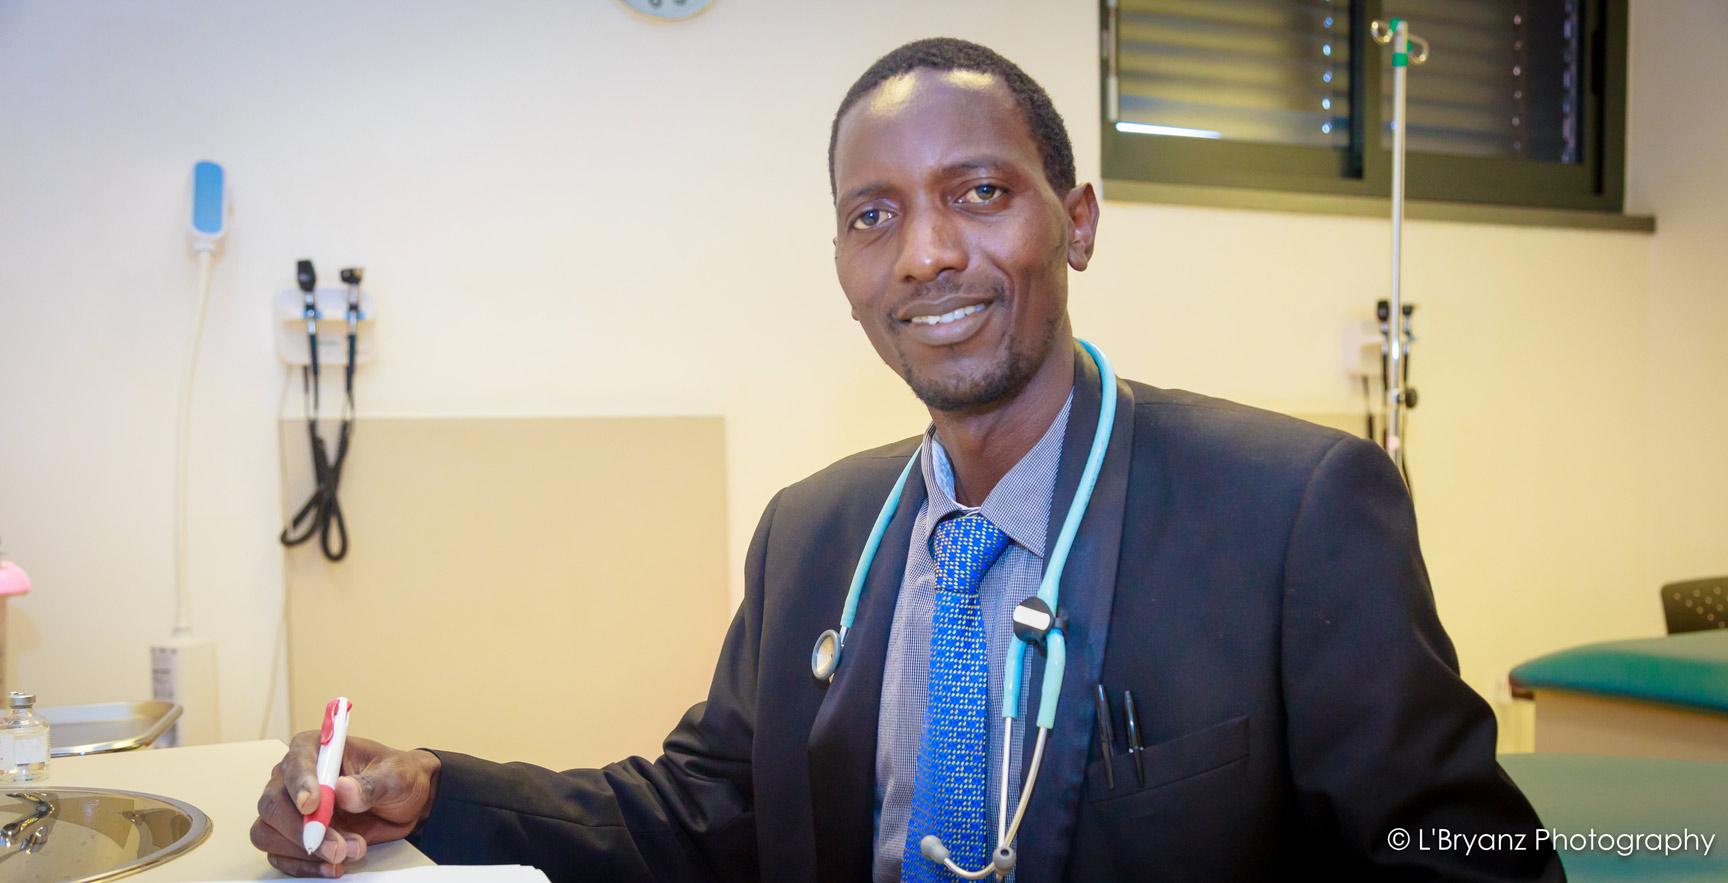 Dr. Kafero